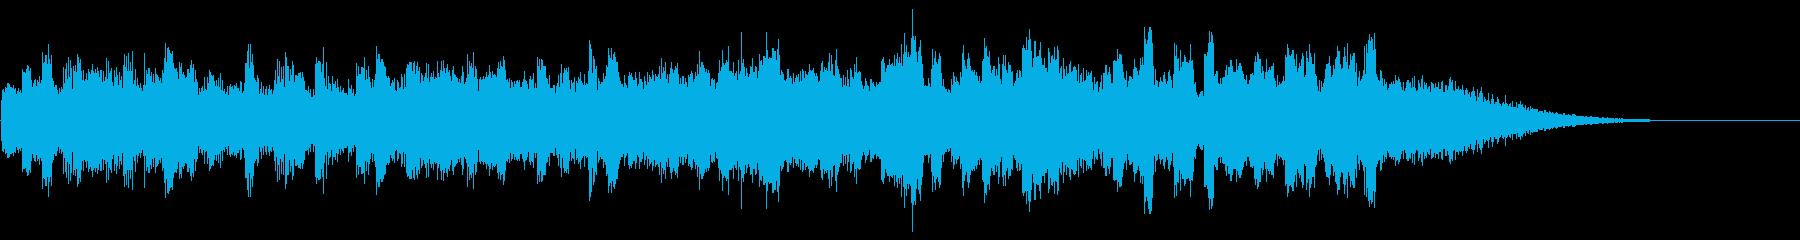 KANTBGM_piano緊迫感2の再生済みの波形